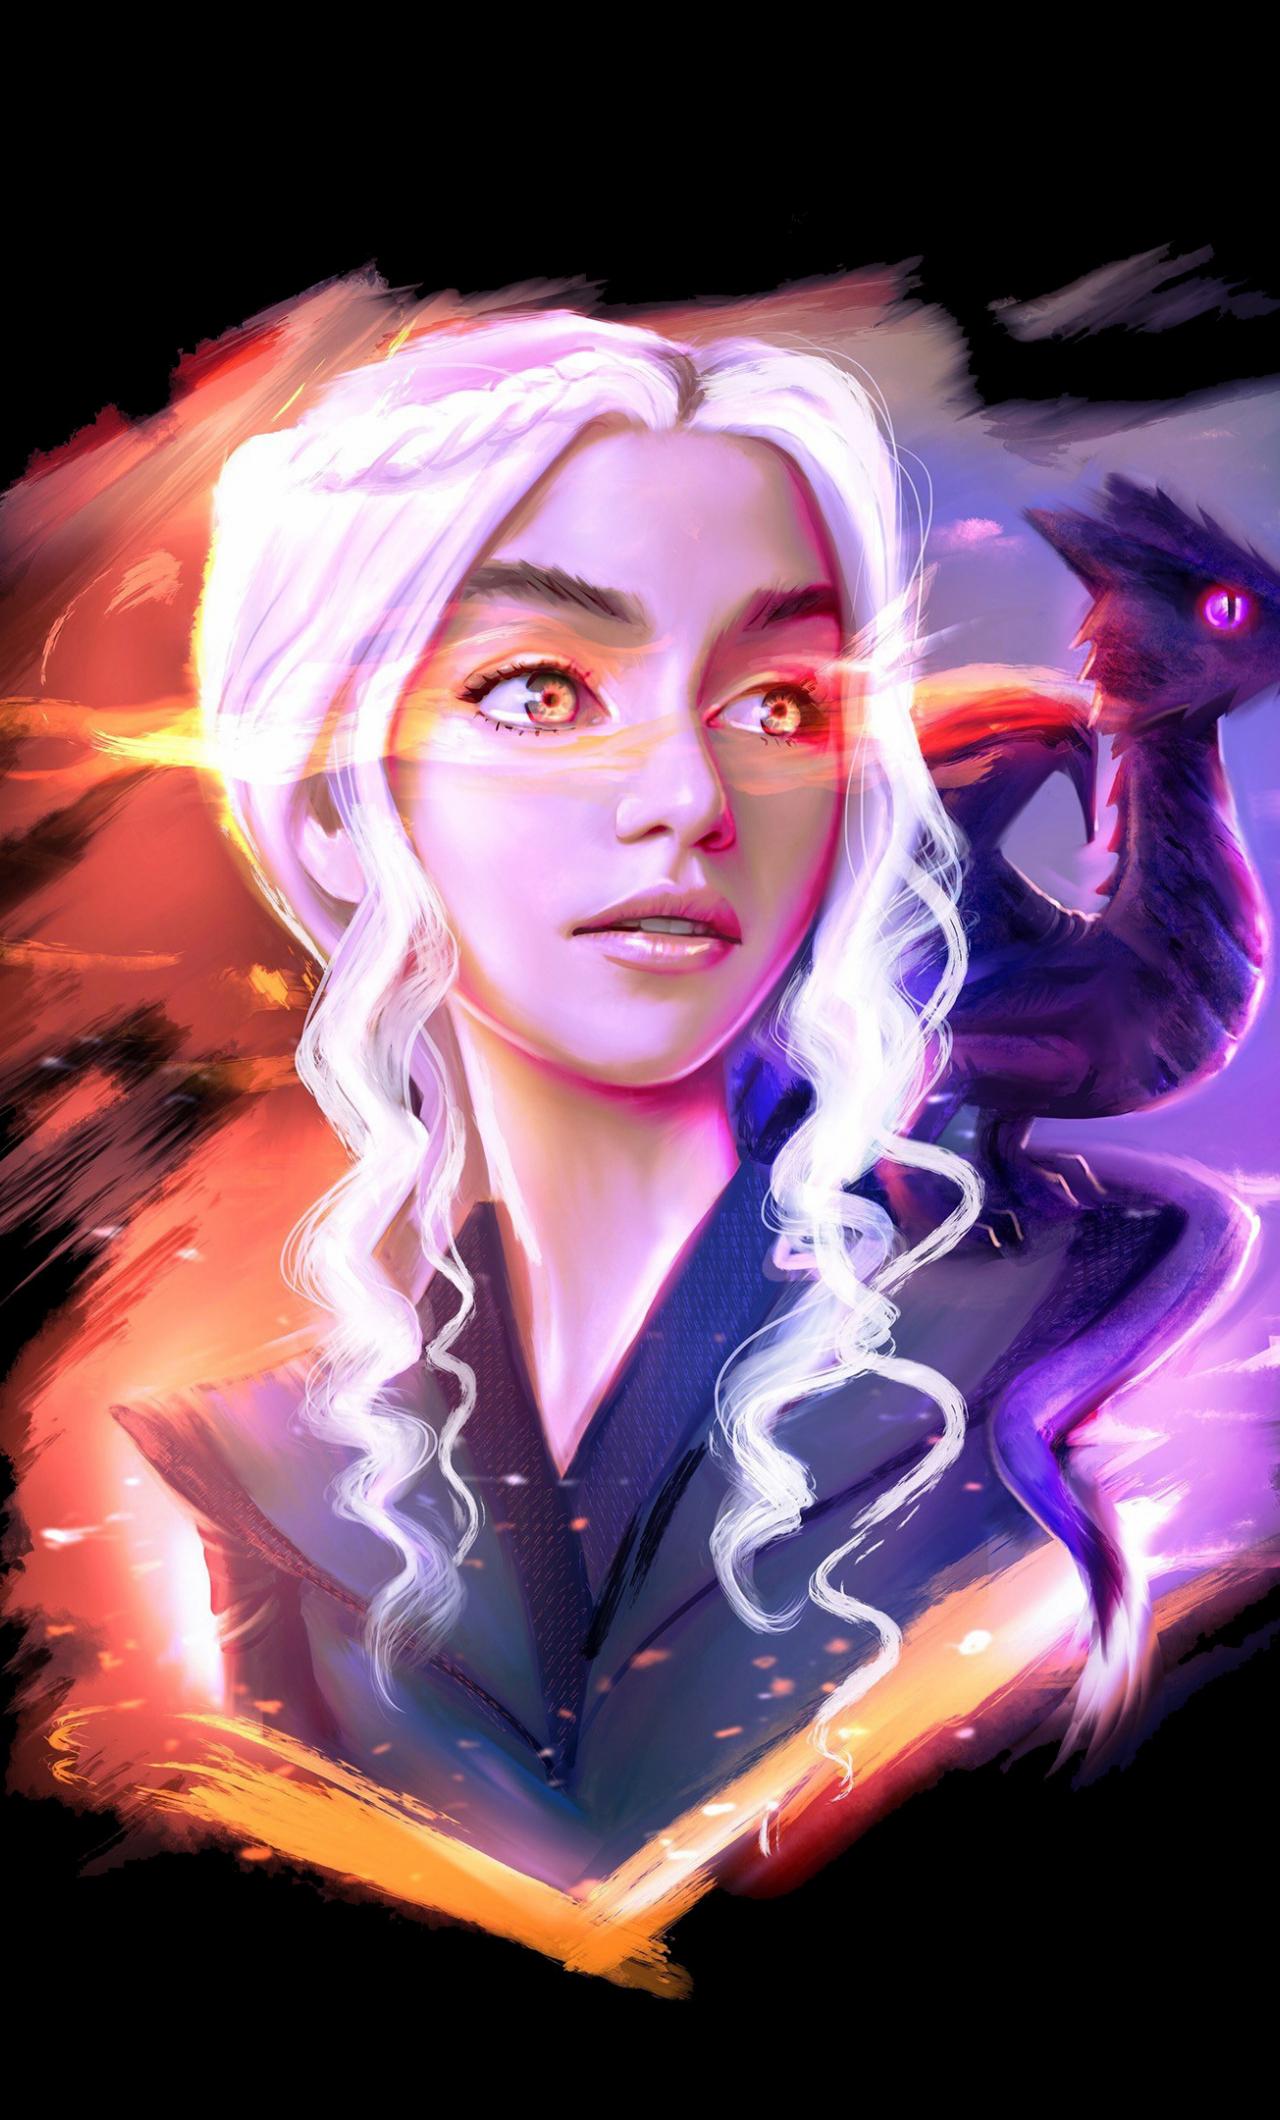 Download 1280x2120 Wallpaper Daenerys Targaryen And Dragon Game